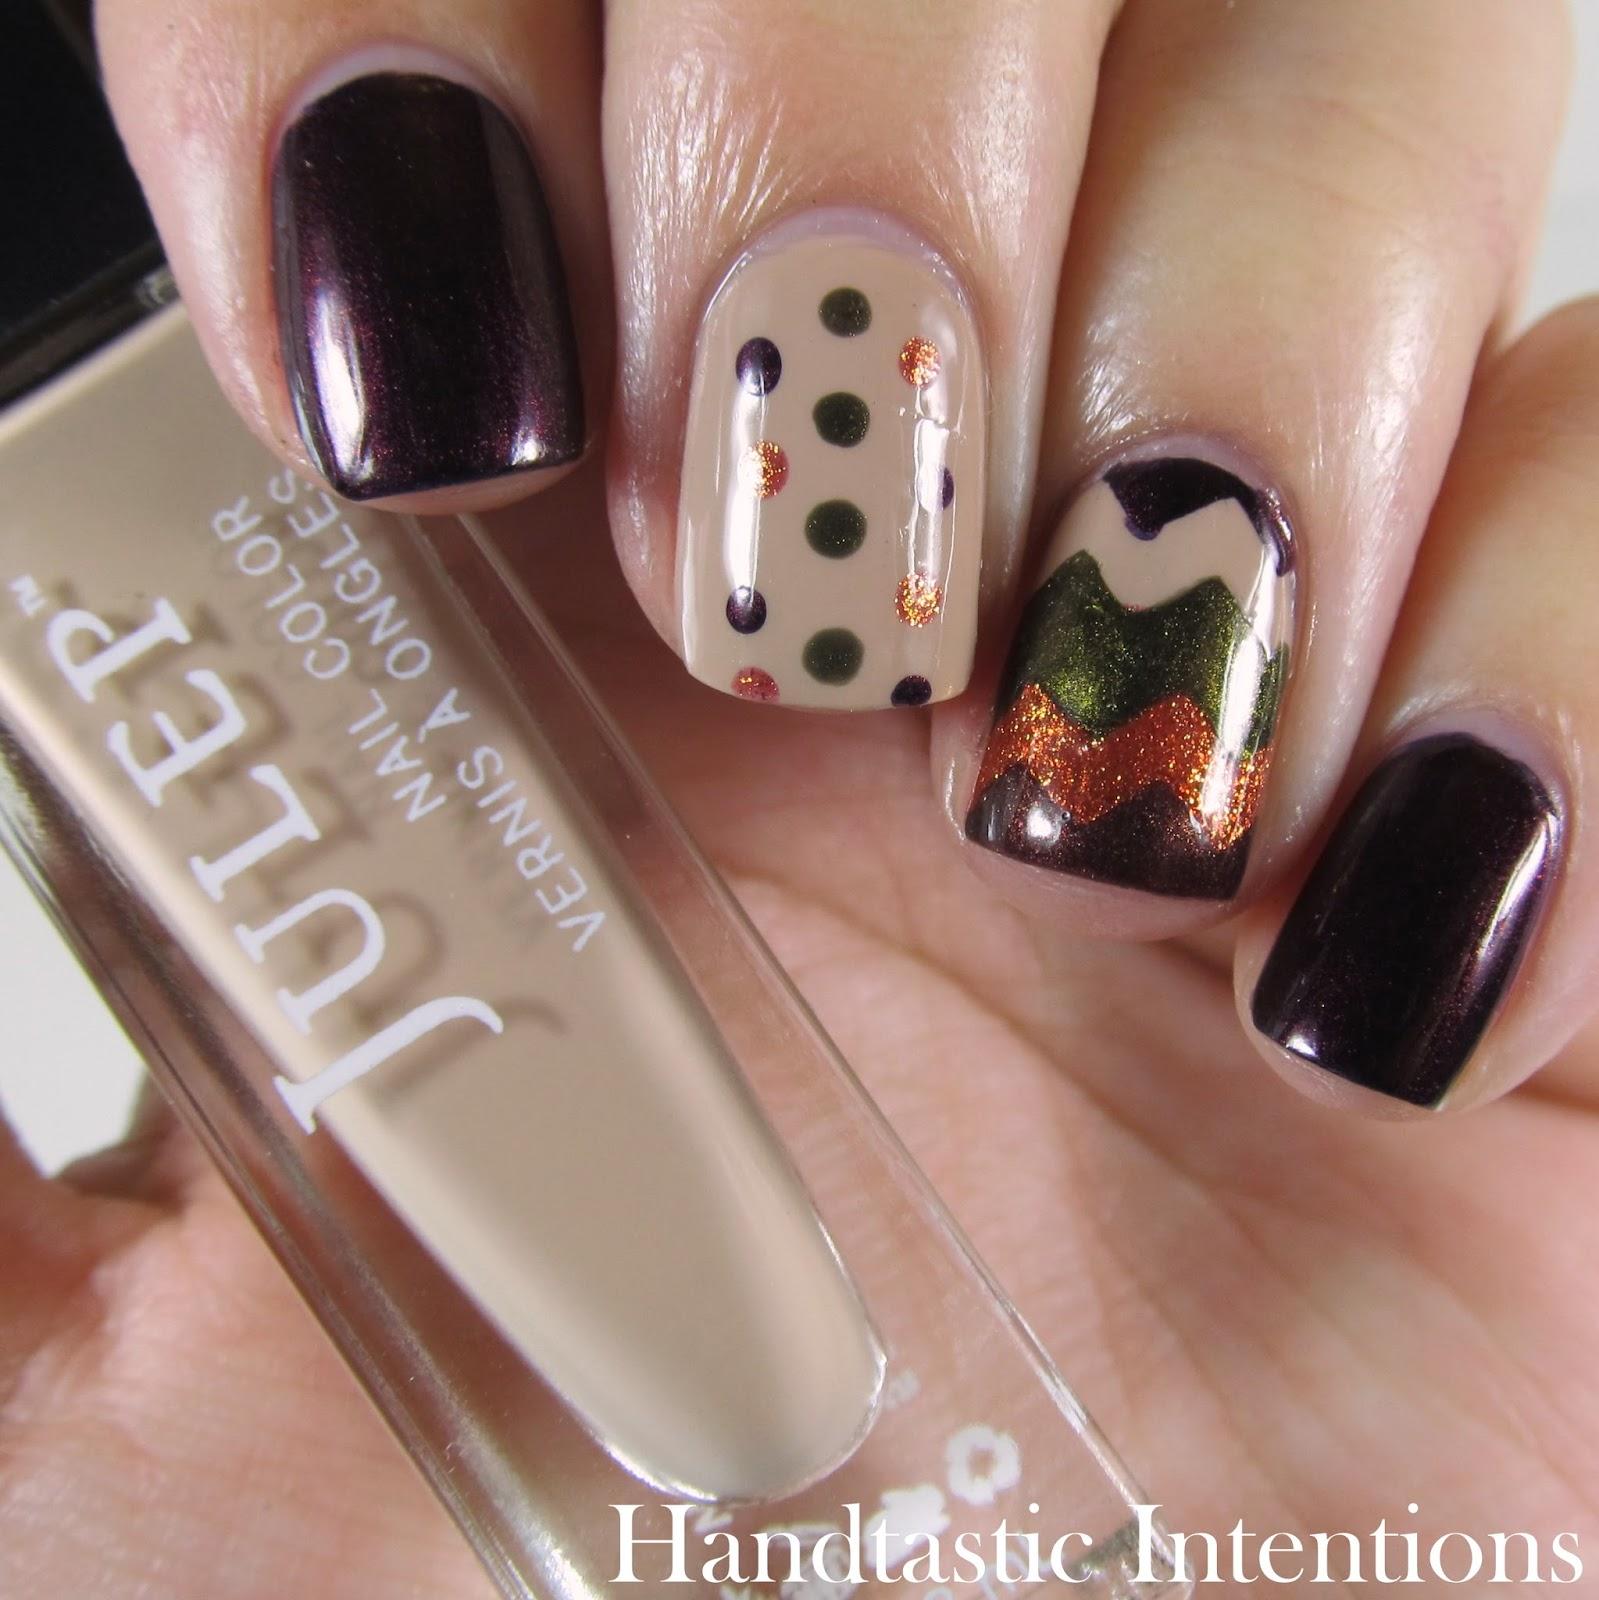 Handtastic Intentions: Fall Chevron Nail Art